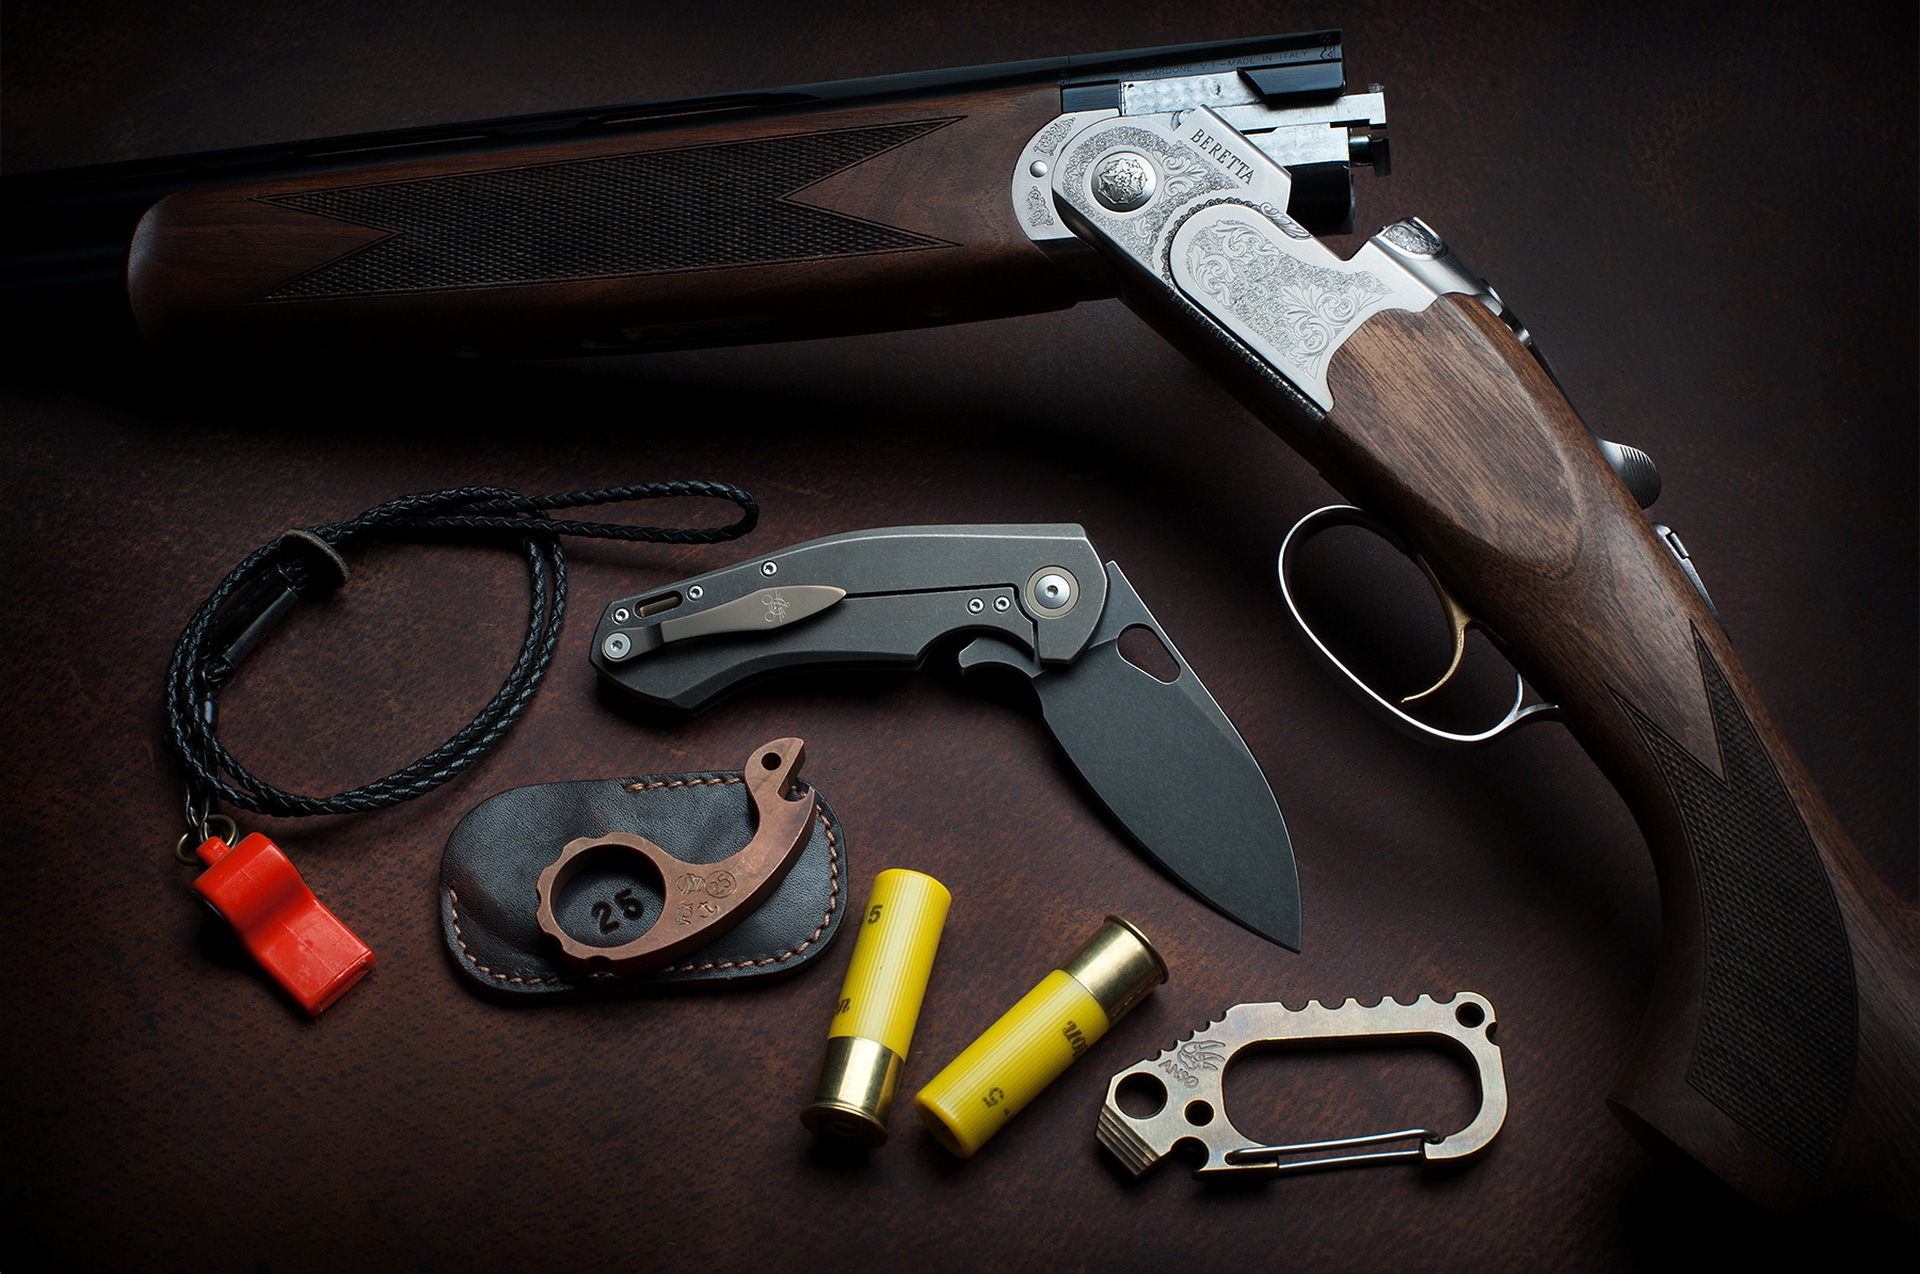 Картинка: Оружие, дробовик, BERETTA, нож, GiantMouse Knives, кобура, патроны, свисток